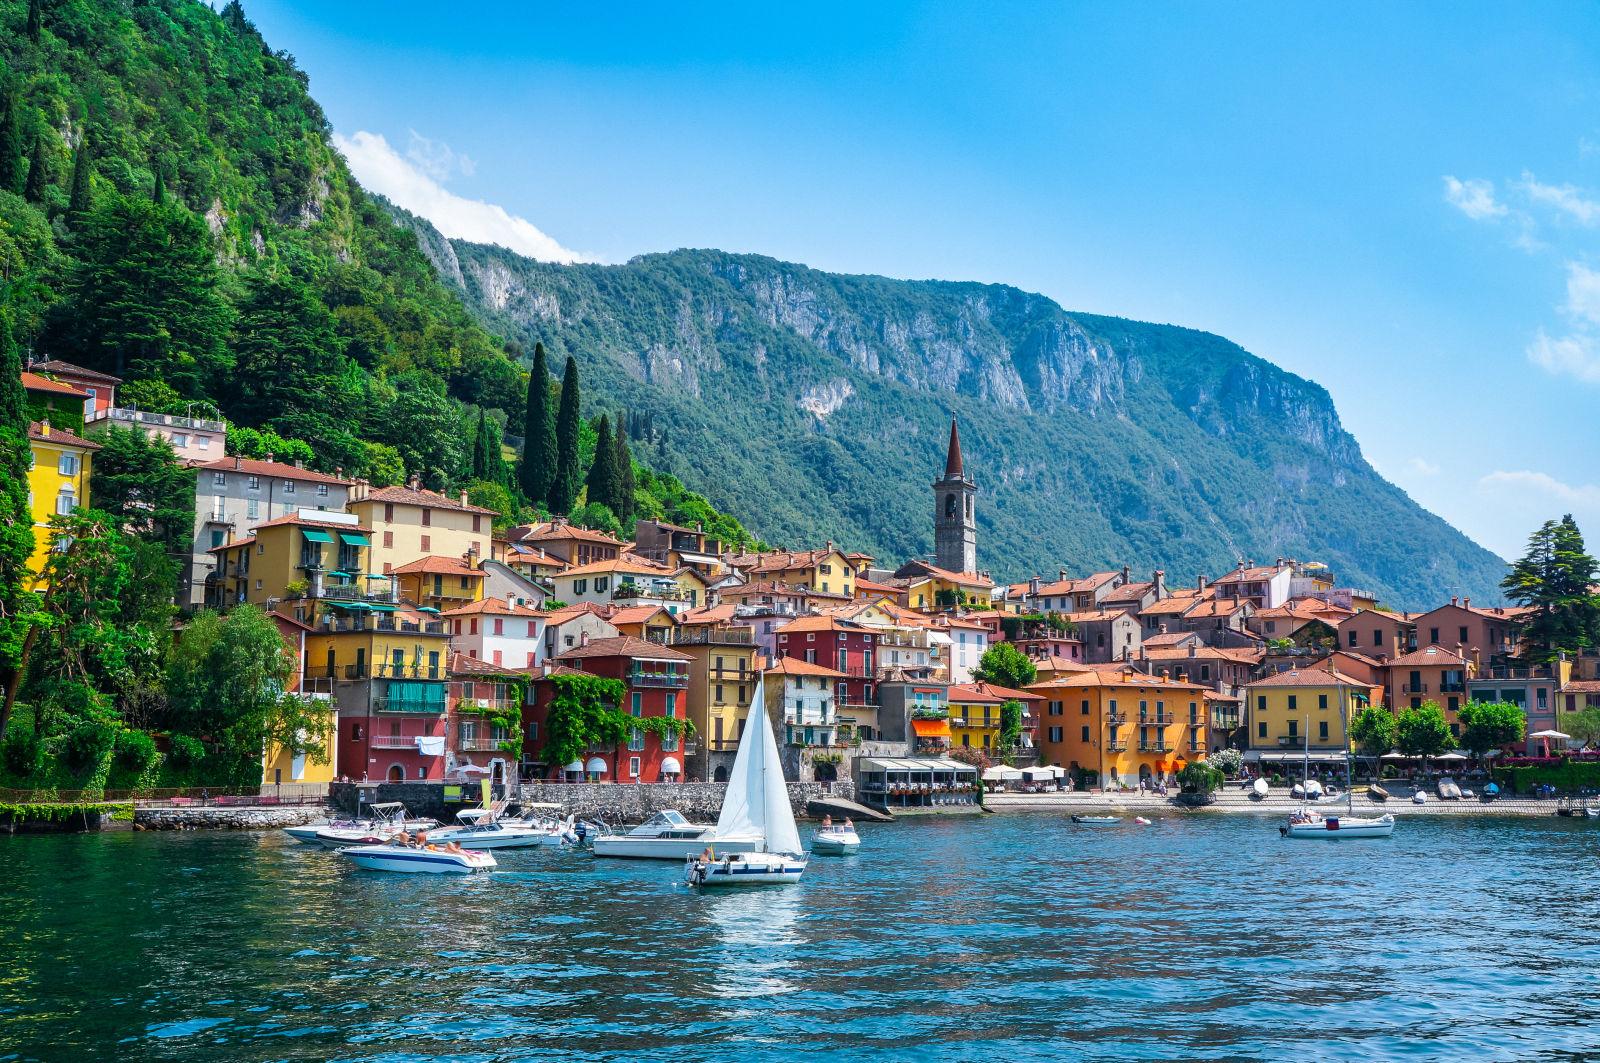 Kleiner Ort am Comer See, Italien